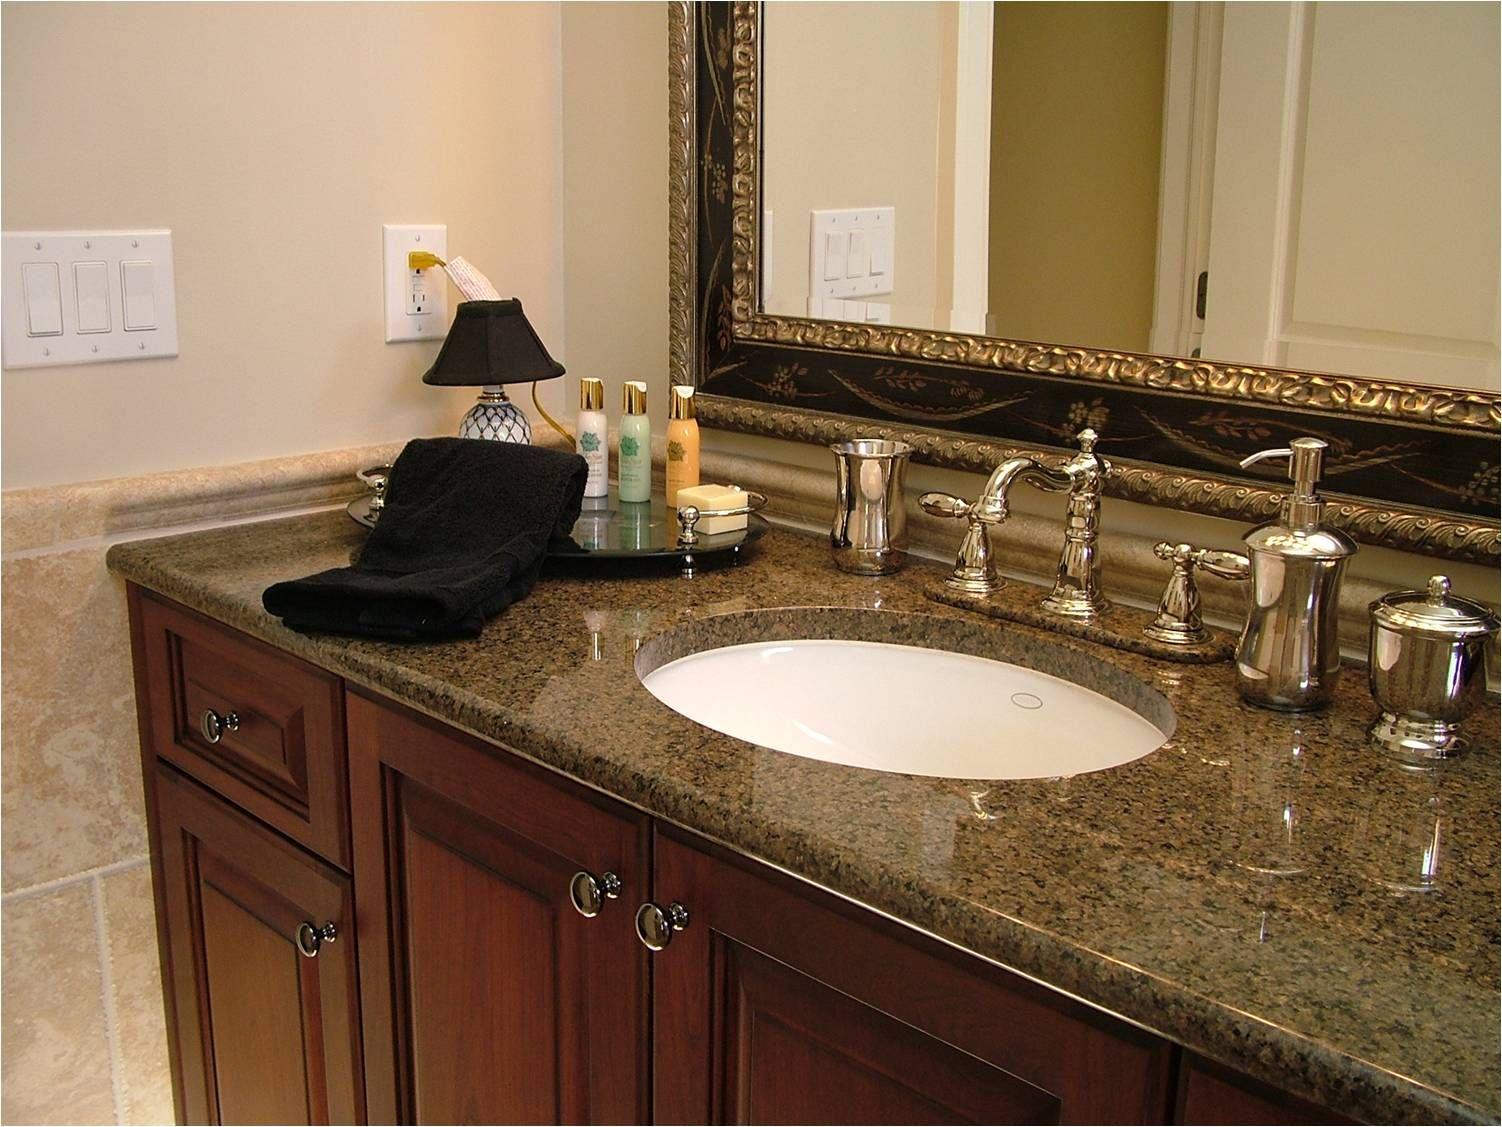 Daveu0027s Granite | Natural Stone, Granite, Quartz Countertops | Chesapeake, Virginia  Beach,